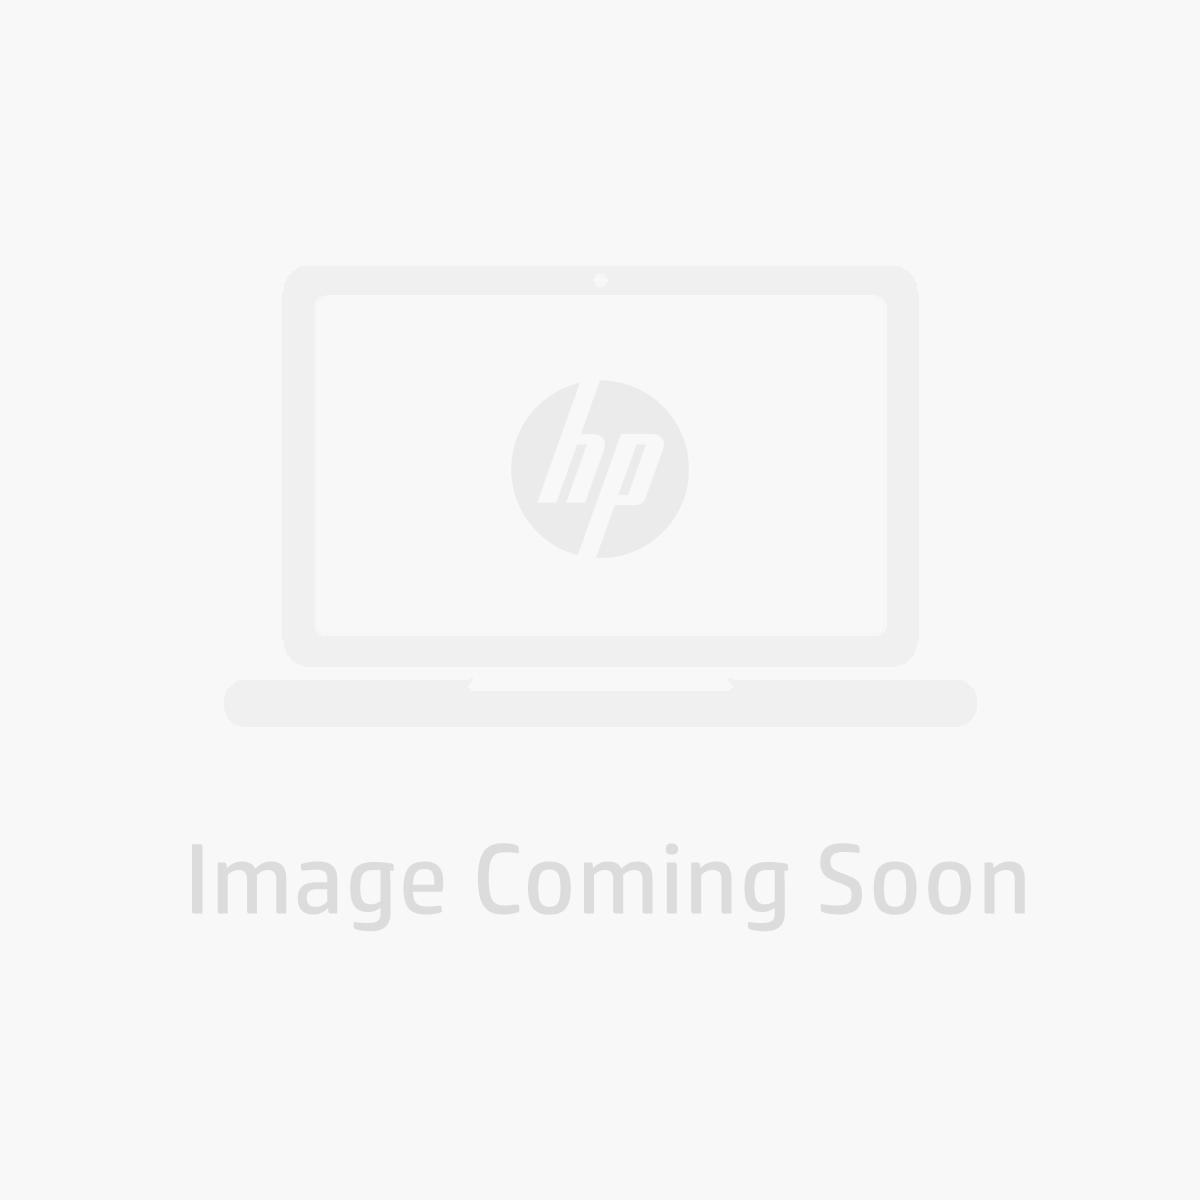 HP Sprocket Photo Printer and ZINK Paper Bundle (20 sheets)